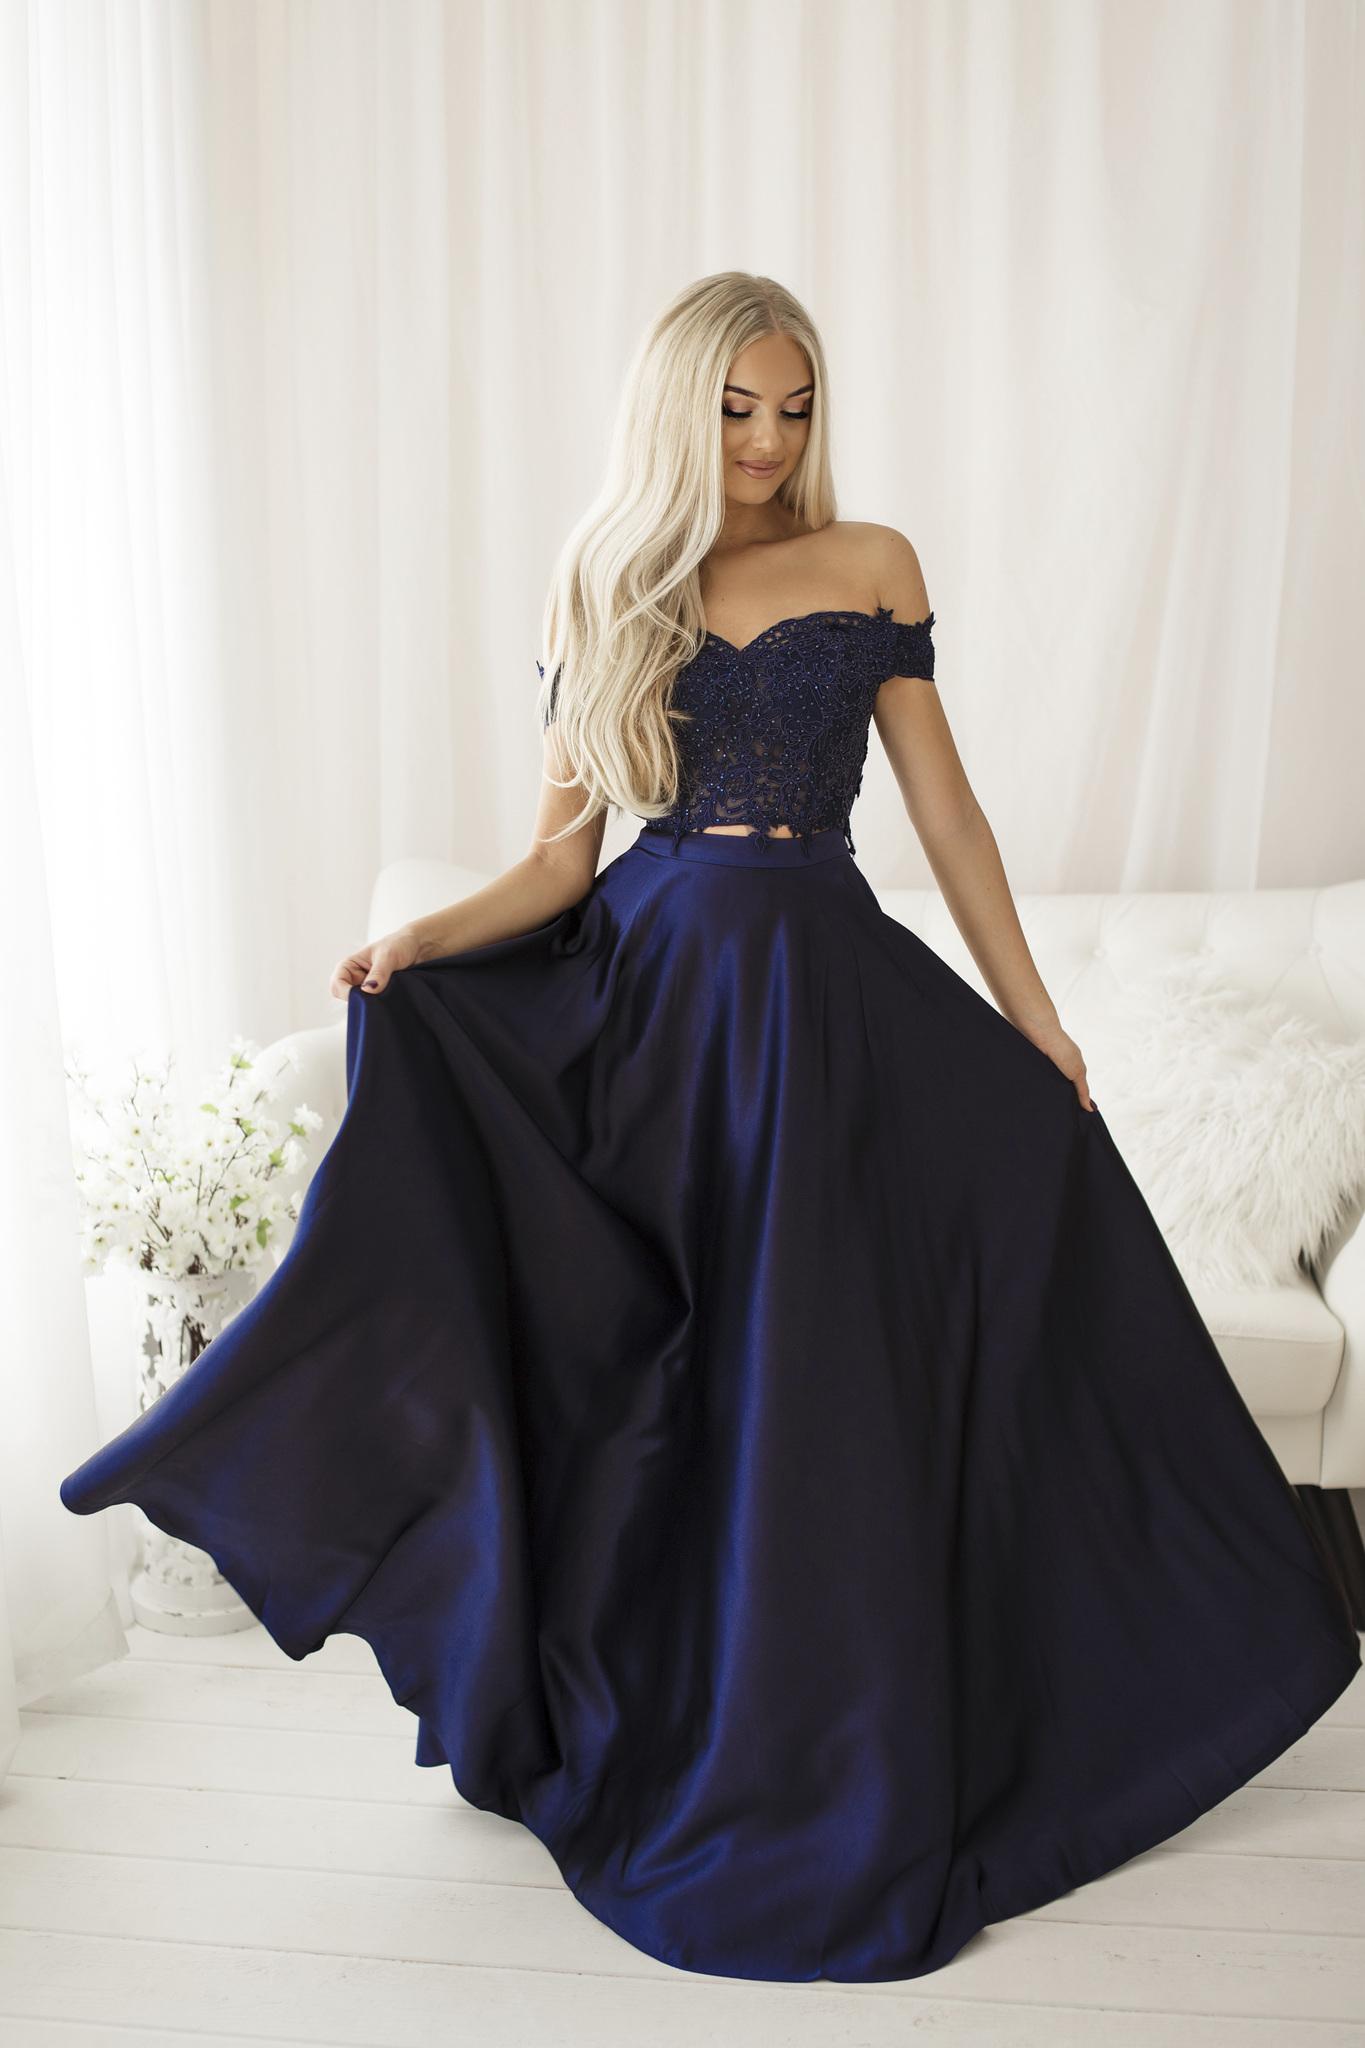 SENAT CORSET DRESS NAVY BLUE 68002-3